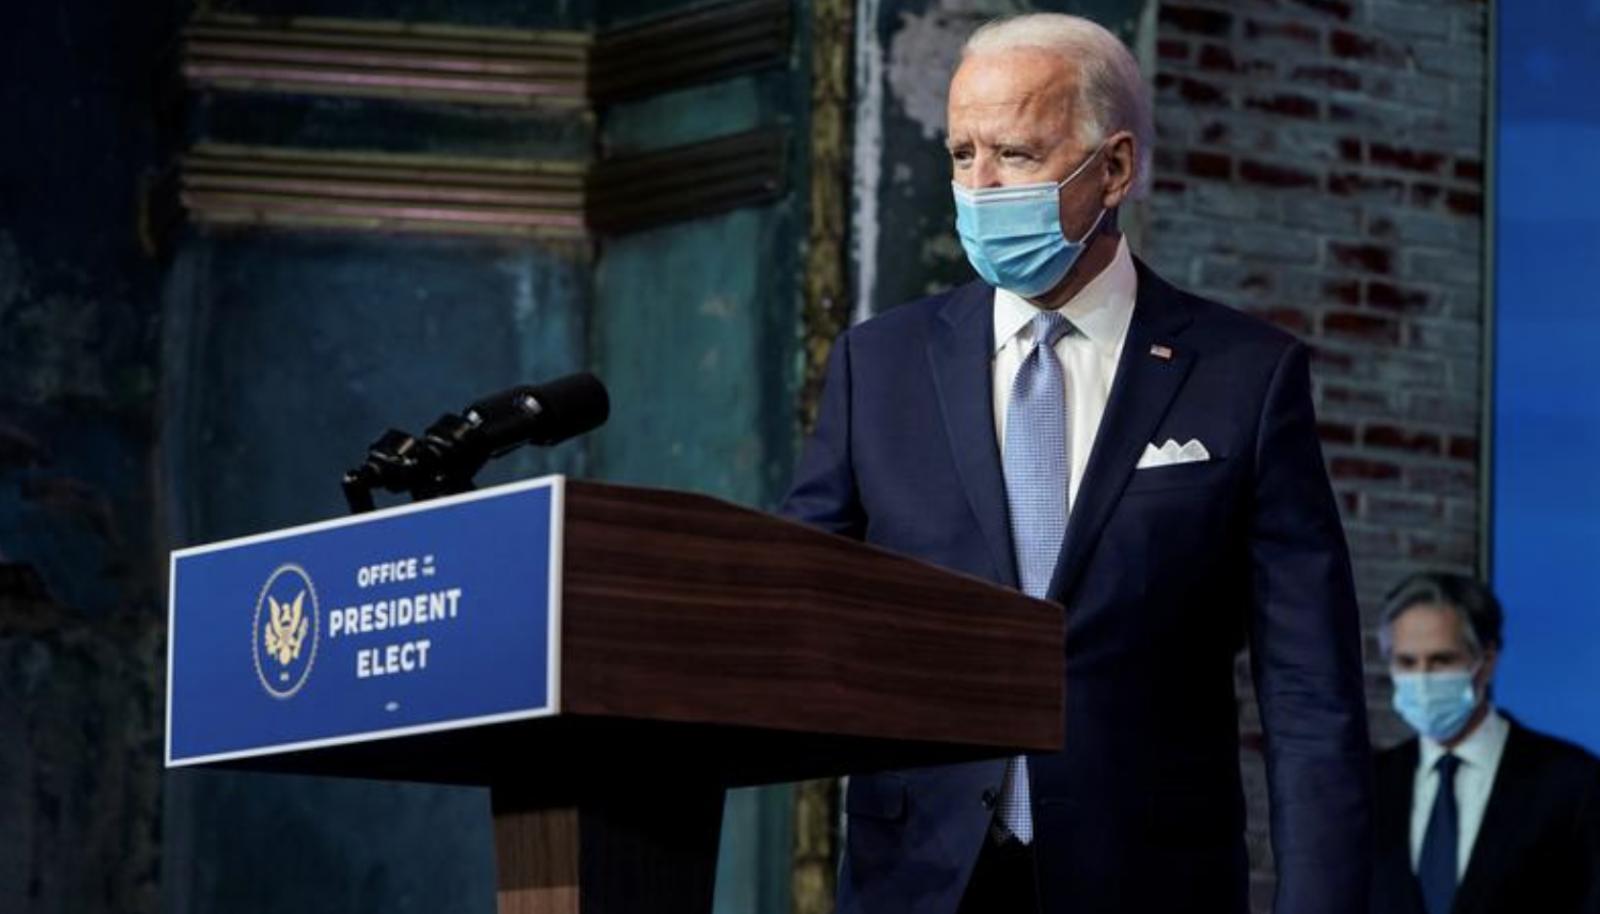 State Department Tells Staff: Transition to Biden Administration Has Begun